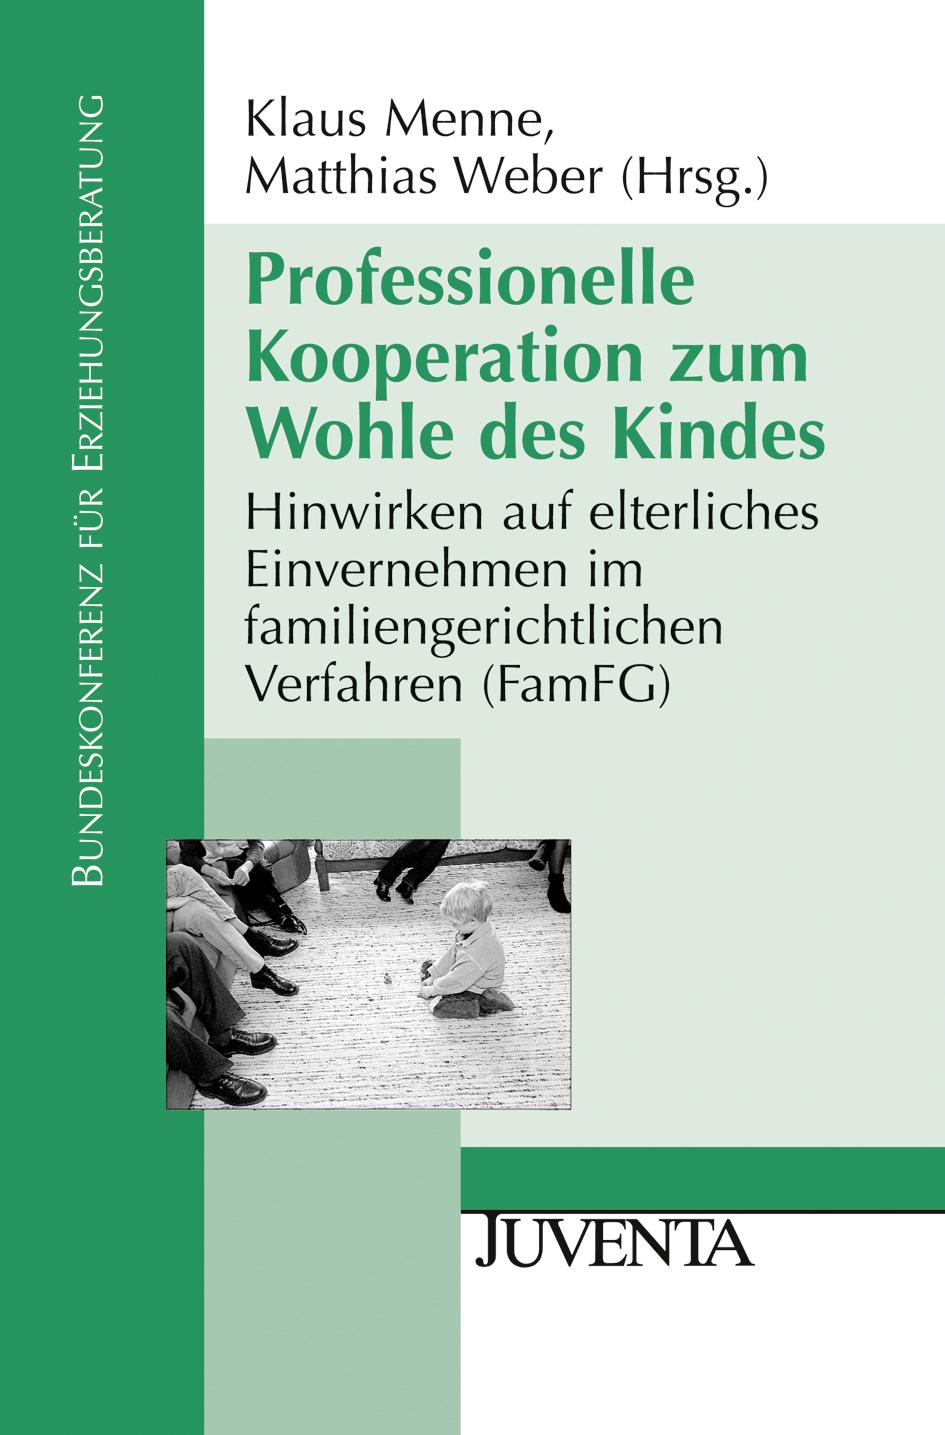 Professionelle Kooperation zum Wohle des Kindes Klaus Menne